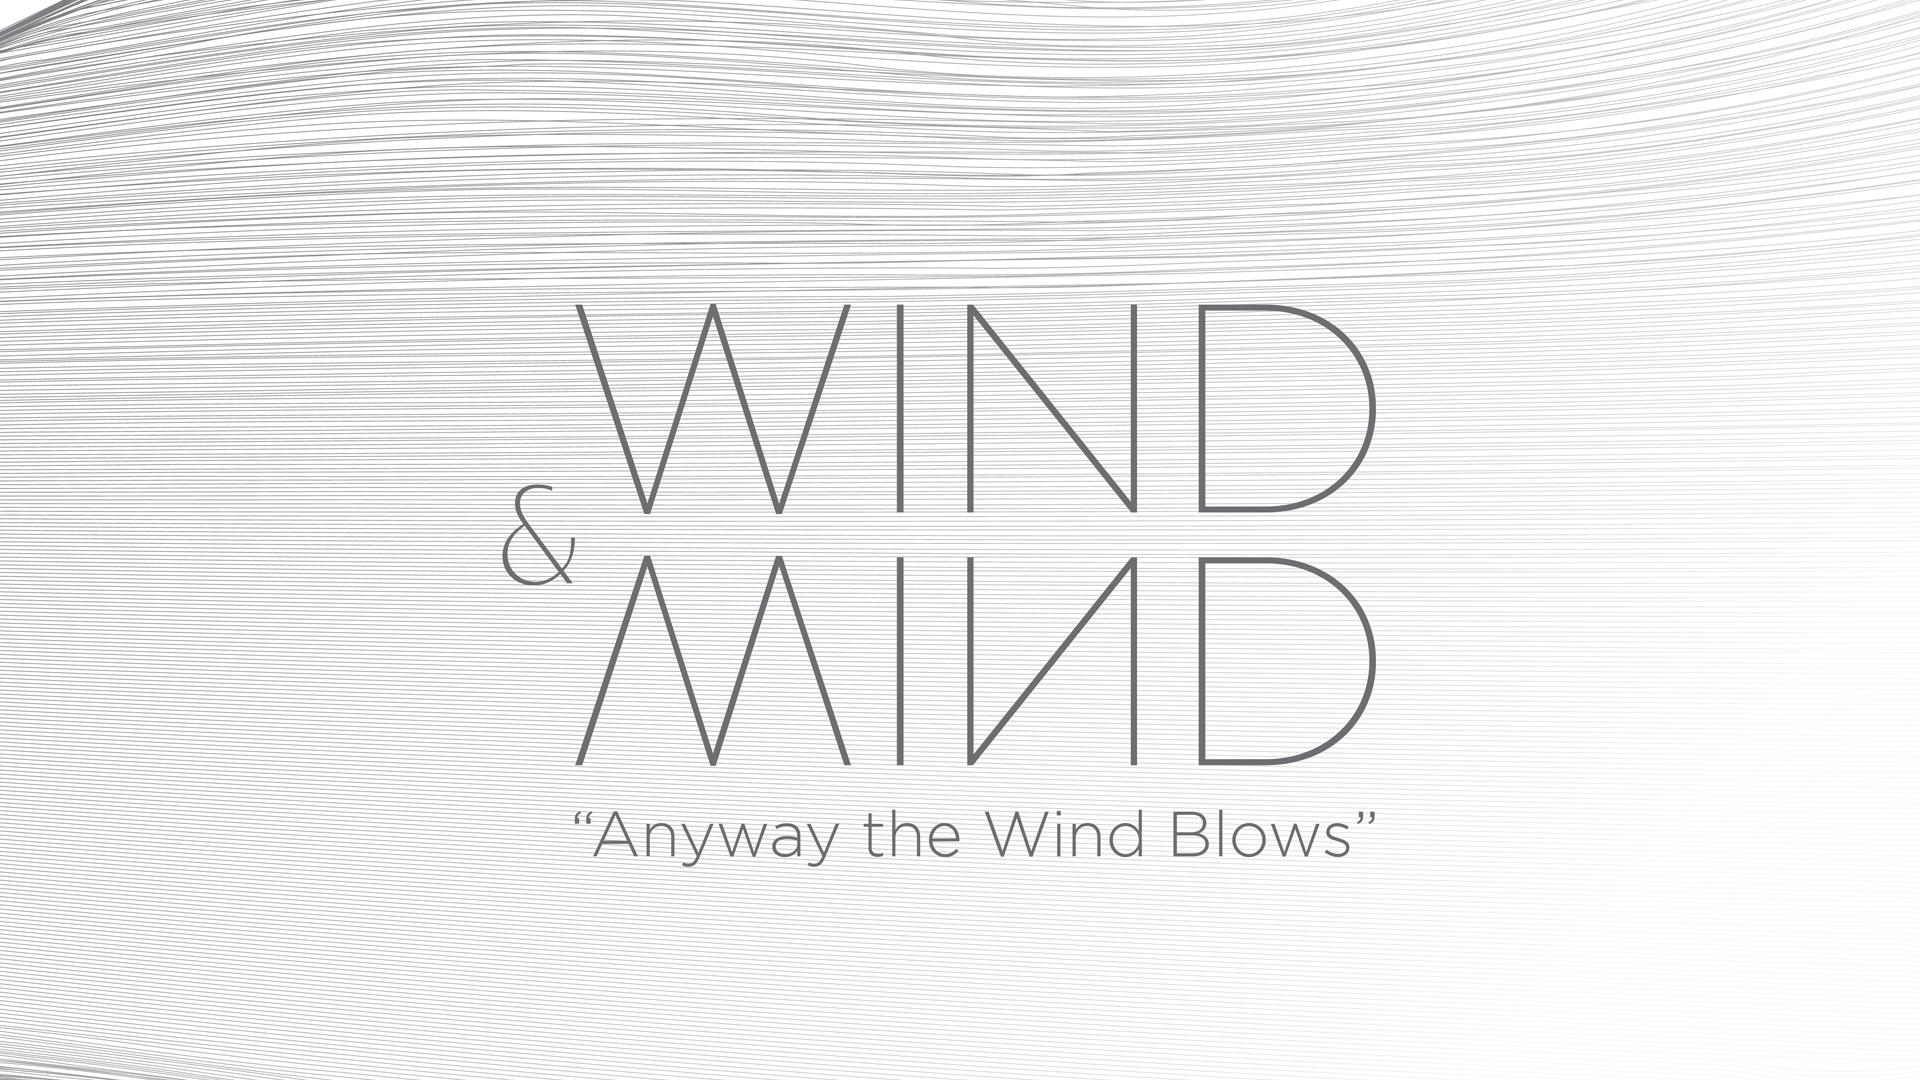 feel the wind blow